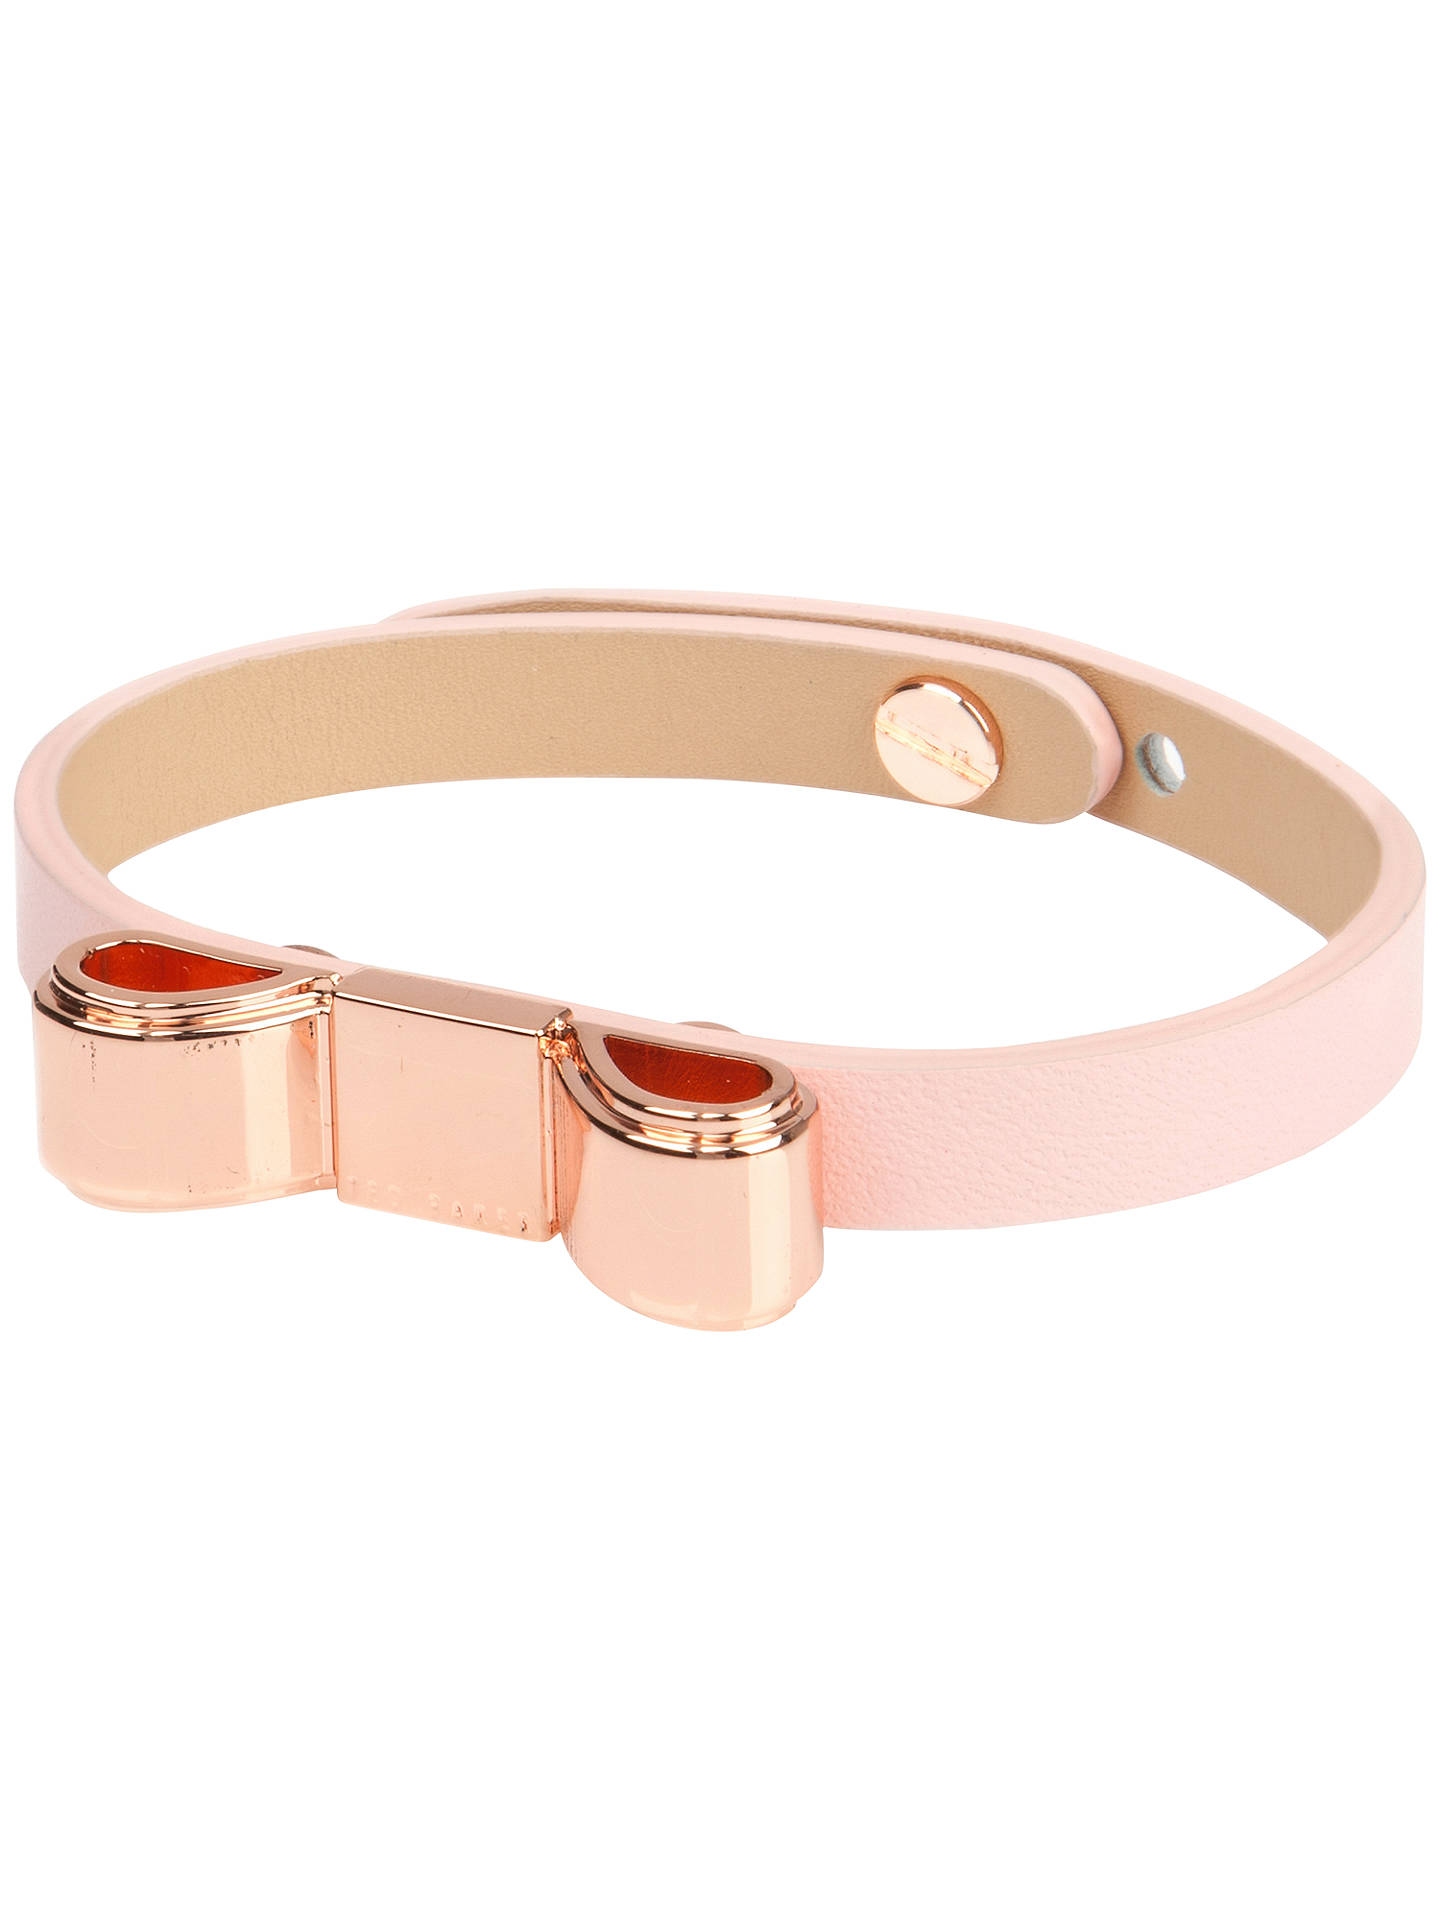 d2facae2c650 Buy Ted Baker Beccee Bow Bracelet